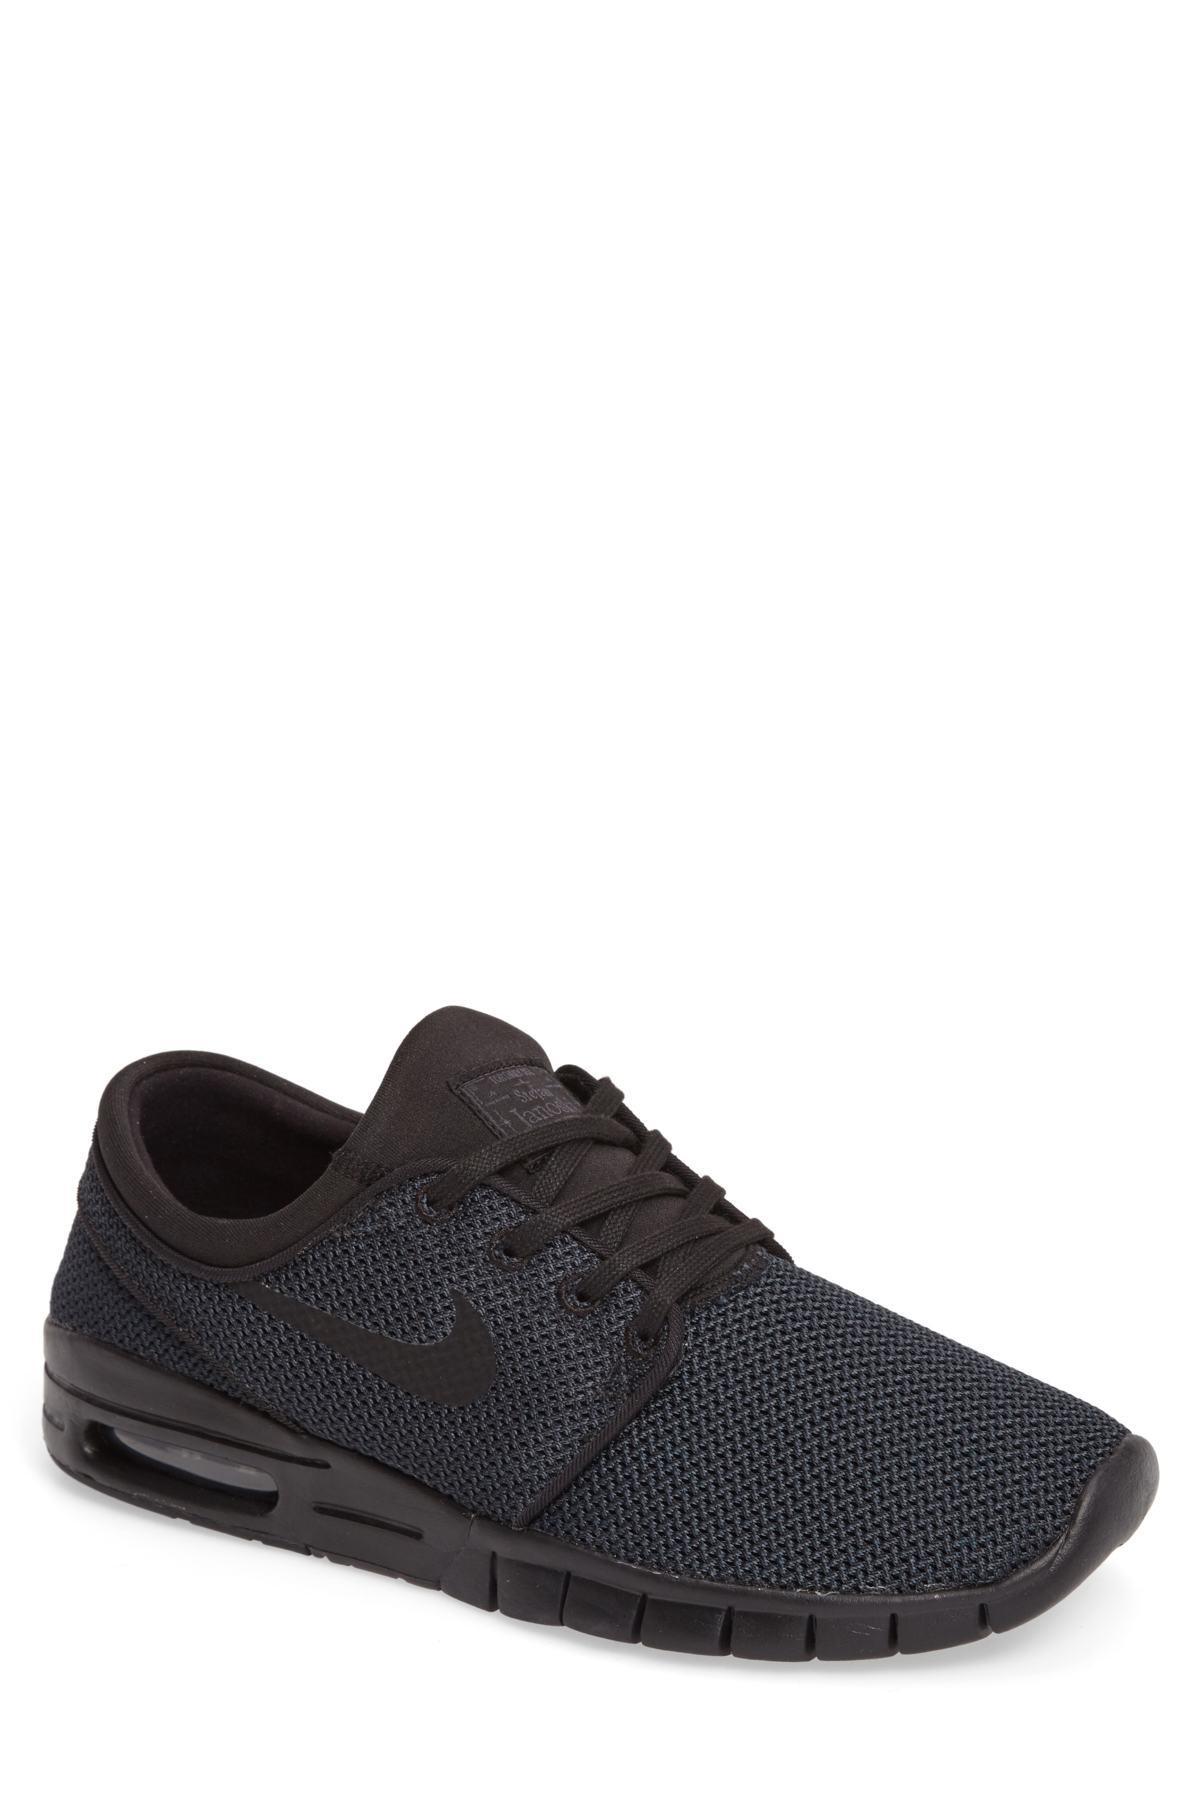 5a81a5c6b3f2 Lyst - Nike  stefan Janoski - Max Sb  Skate Shoe (men) in Black for Men